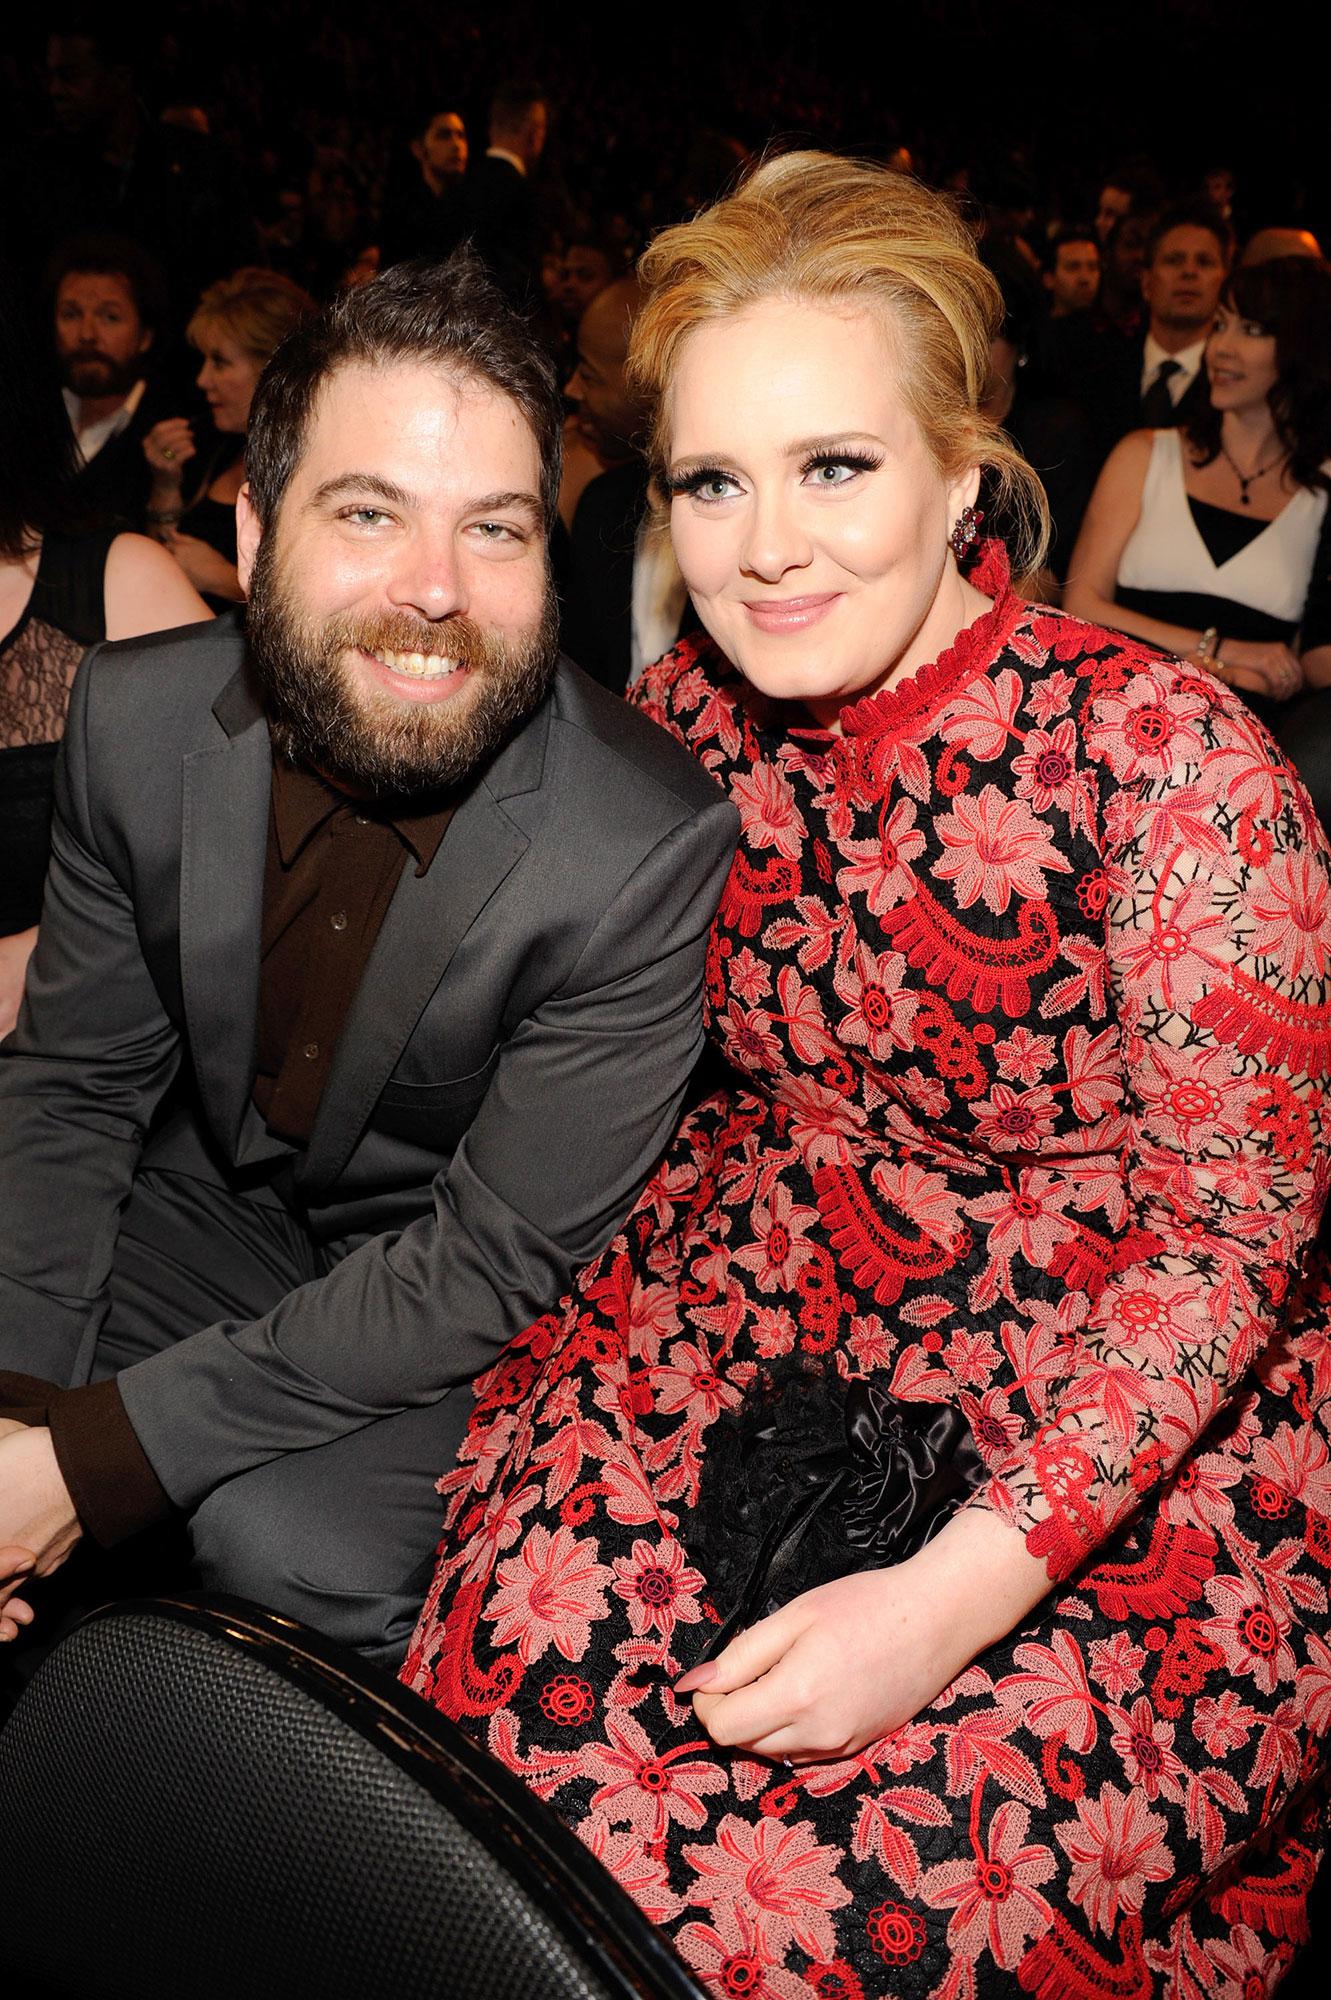 Adele and Simon Konecki - Simon Konecki and Adele attend the 55th Grammy Awards at Staples Center in Los Angeles on February 10, 2013.